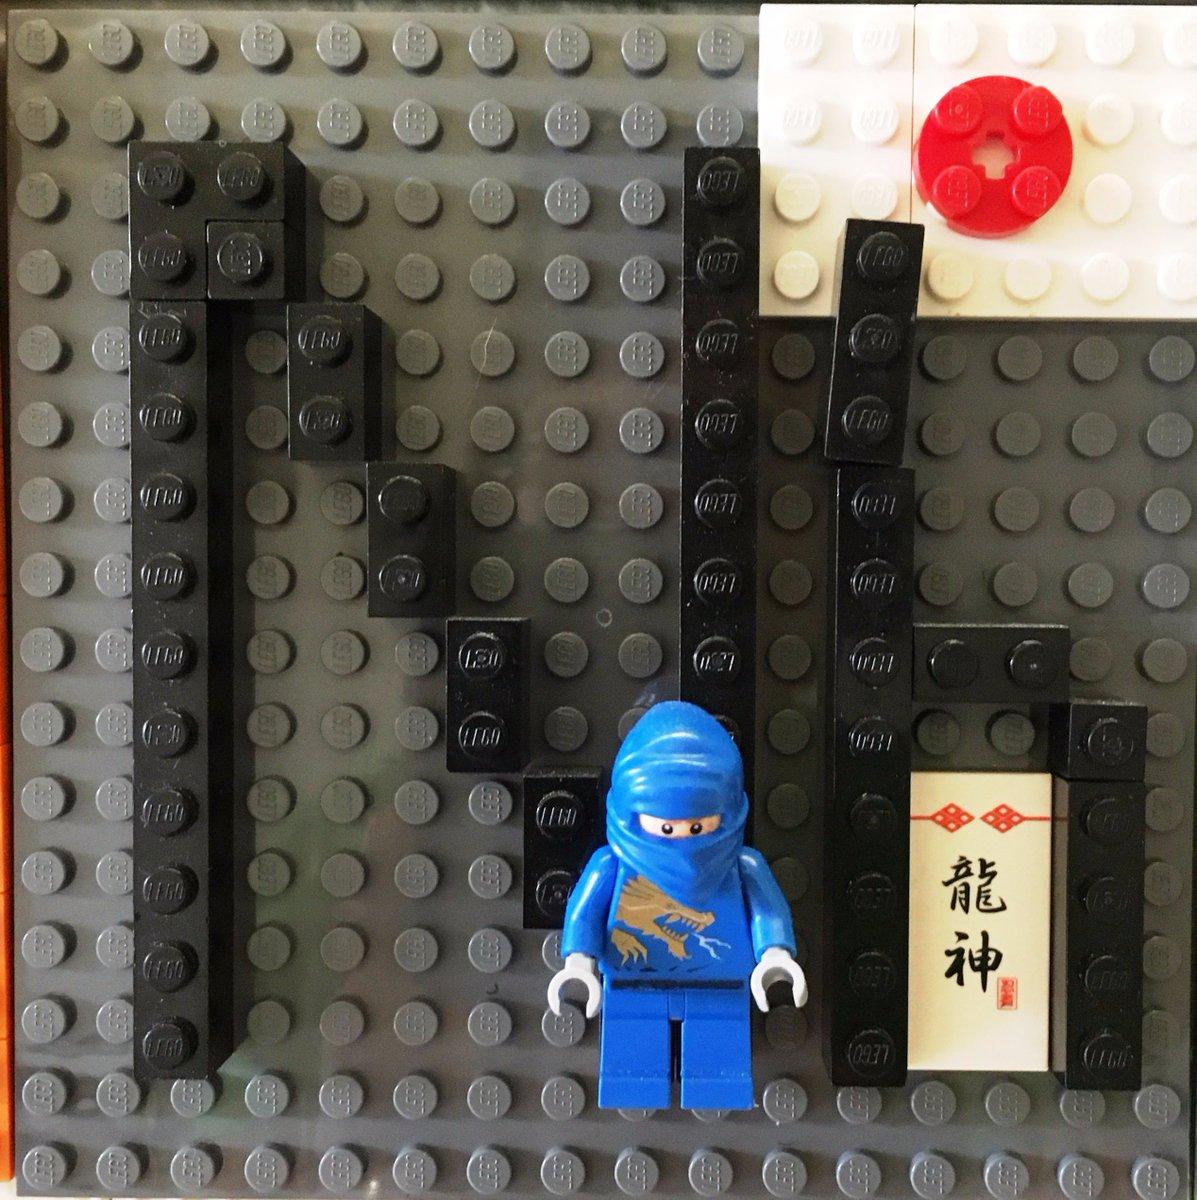 Tom Kuntzleman On Twitter Lego Periodic Table Has Finally Been